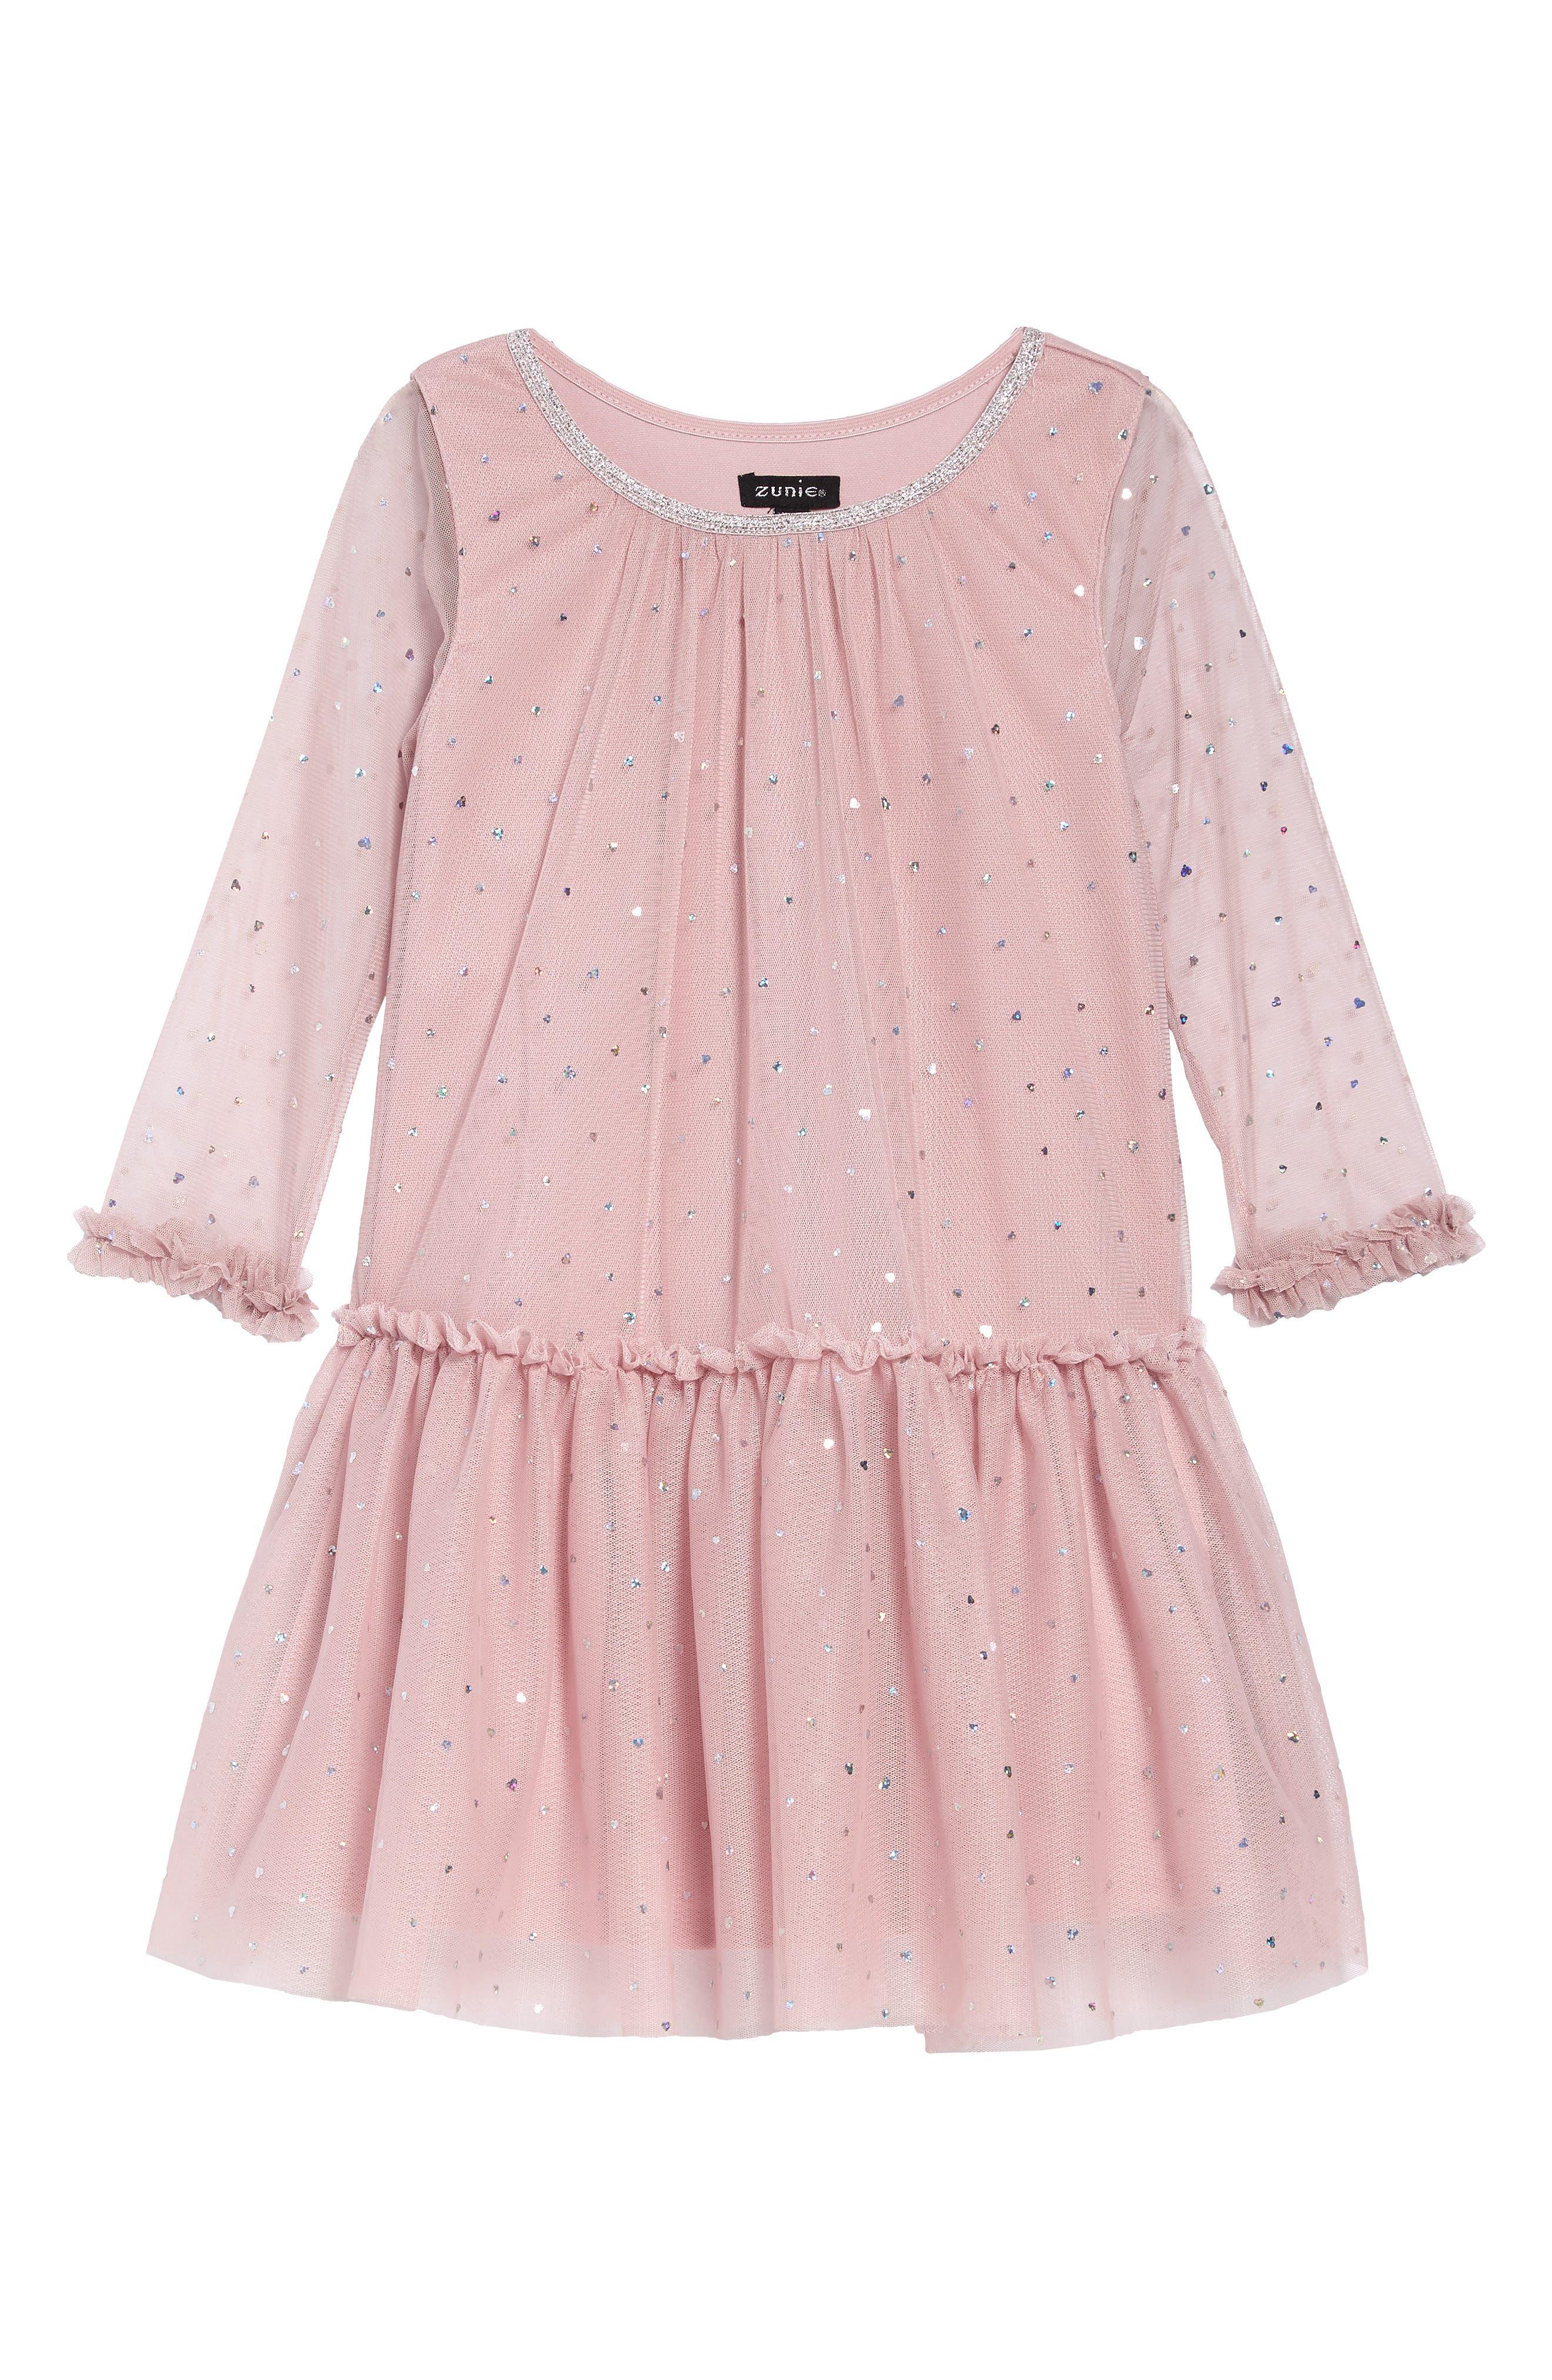 Vintage Style Children's Clothing: Girls, Boys, Baby, Toddler Toddler Girls Zunie Sequin Tulle Drop Waist Dress Size 3T - Pink $48.00 AT vintagedancer.com